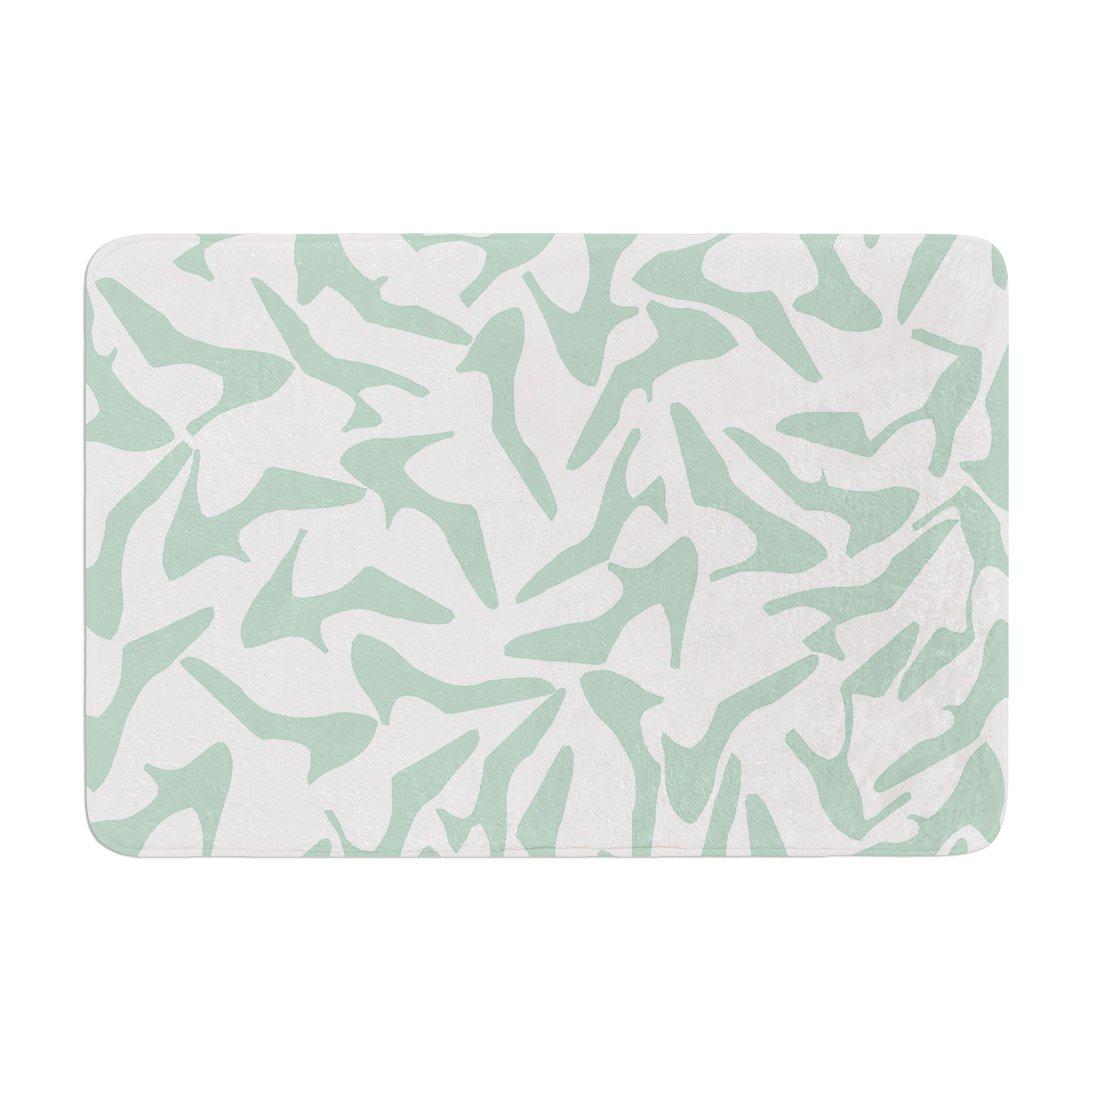 69 x 70 Shower Curtain Kess InHouse Iris Lehnhardt Tex Mix Jade Abstract Green